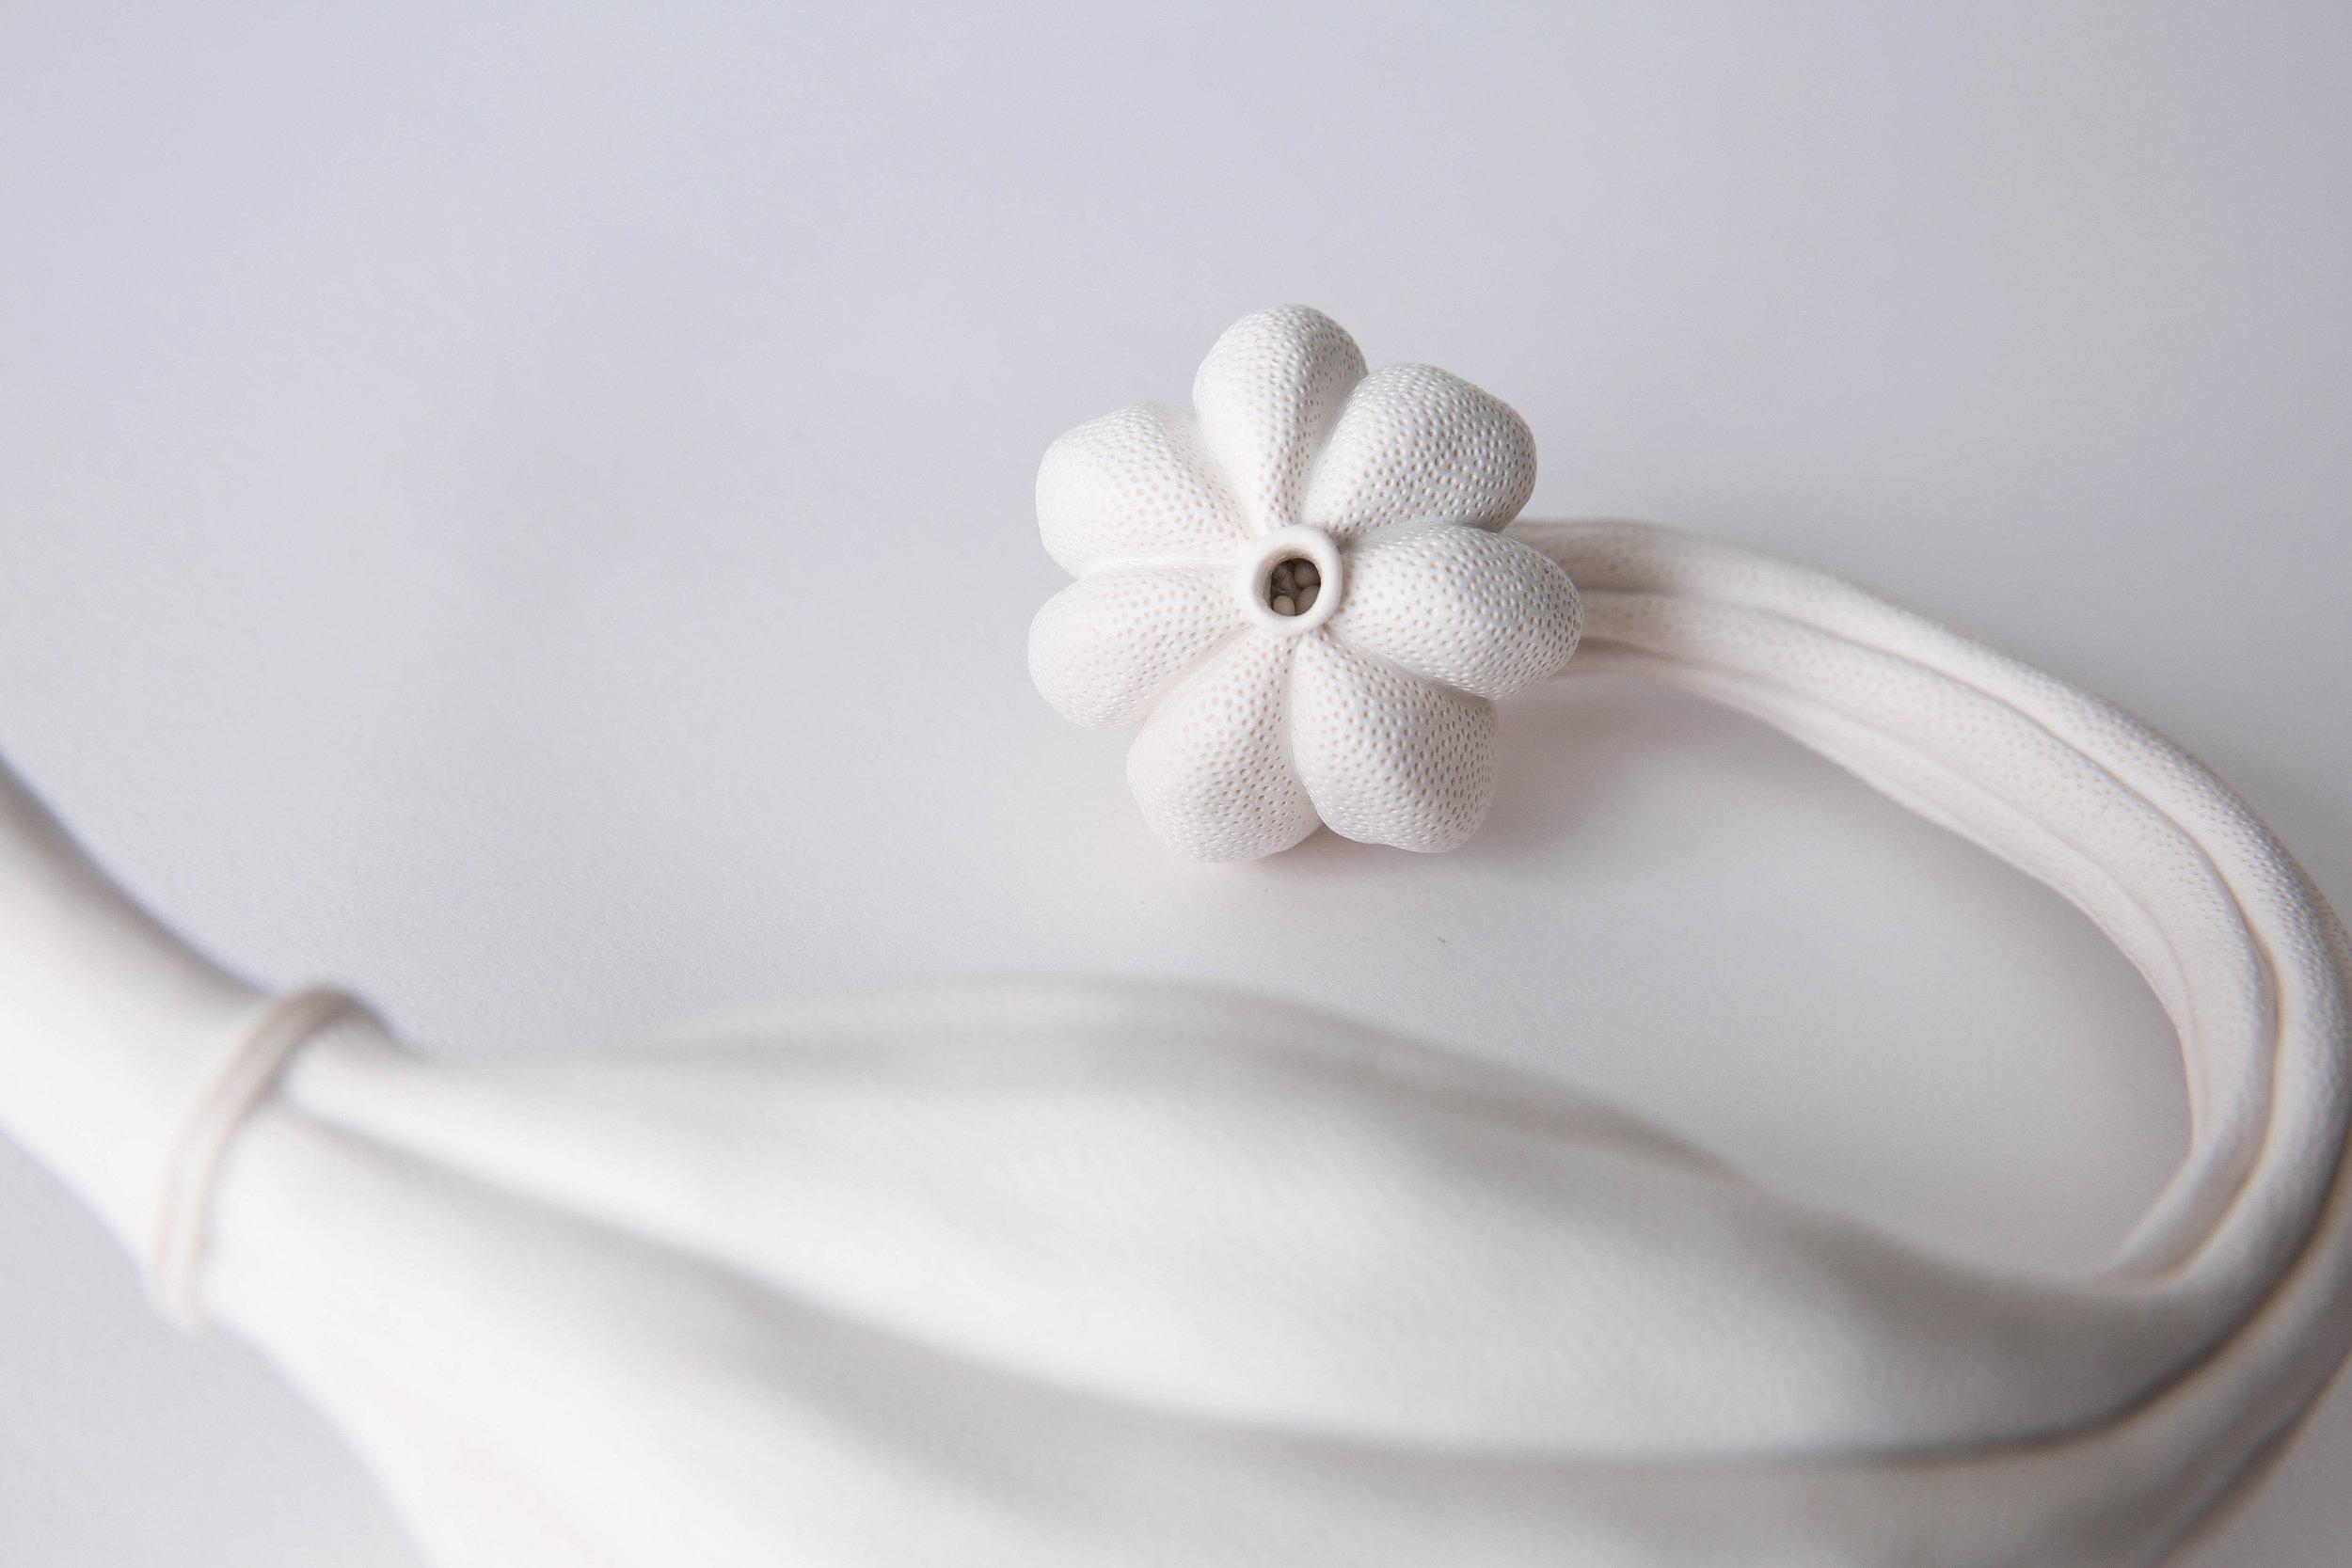 Sarah Rayner,  Telopea truncata Flowerbone Series detail , 2019, hand carved porcelain, Terra Sigillata, various dimensions, Photo: Cristie Quail